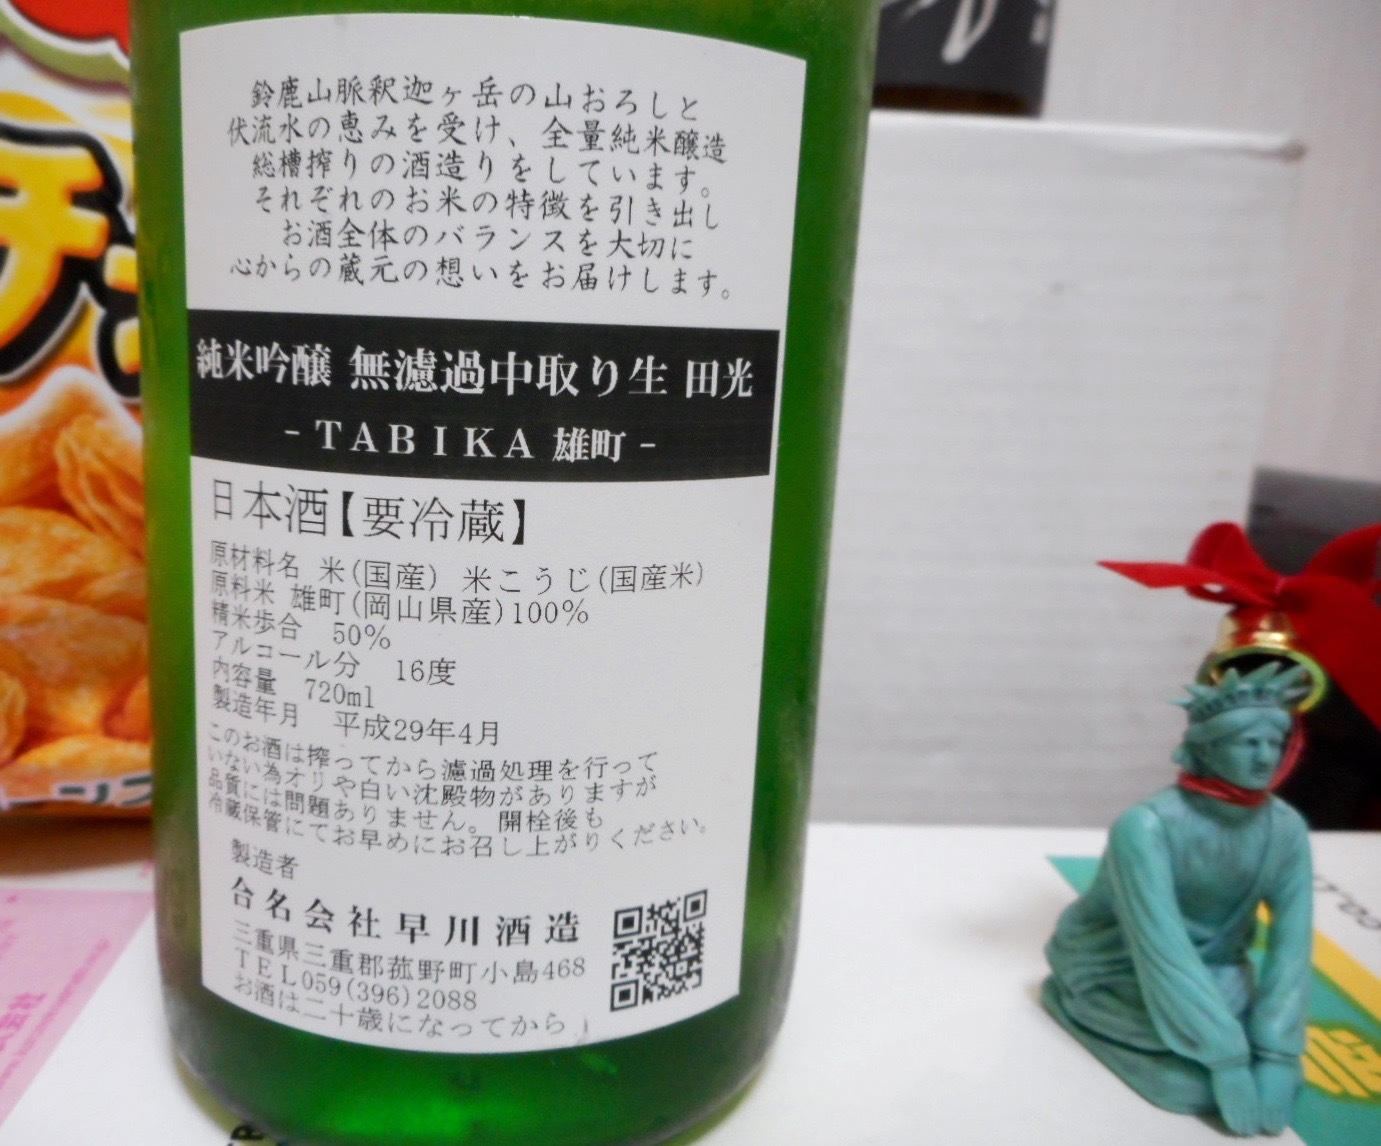 tabika_jungin_omachi_nama28by2.jpg